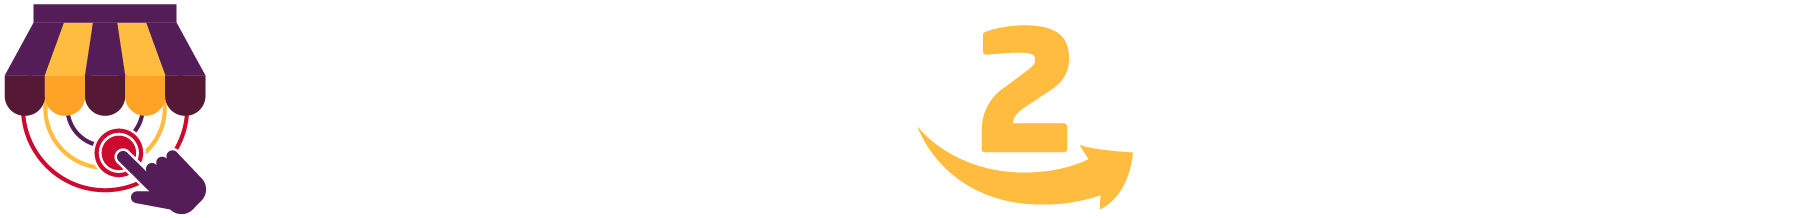 Bricks 2 Clicks Horizontal Logo